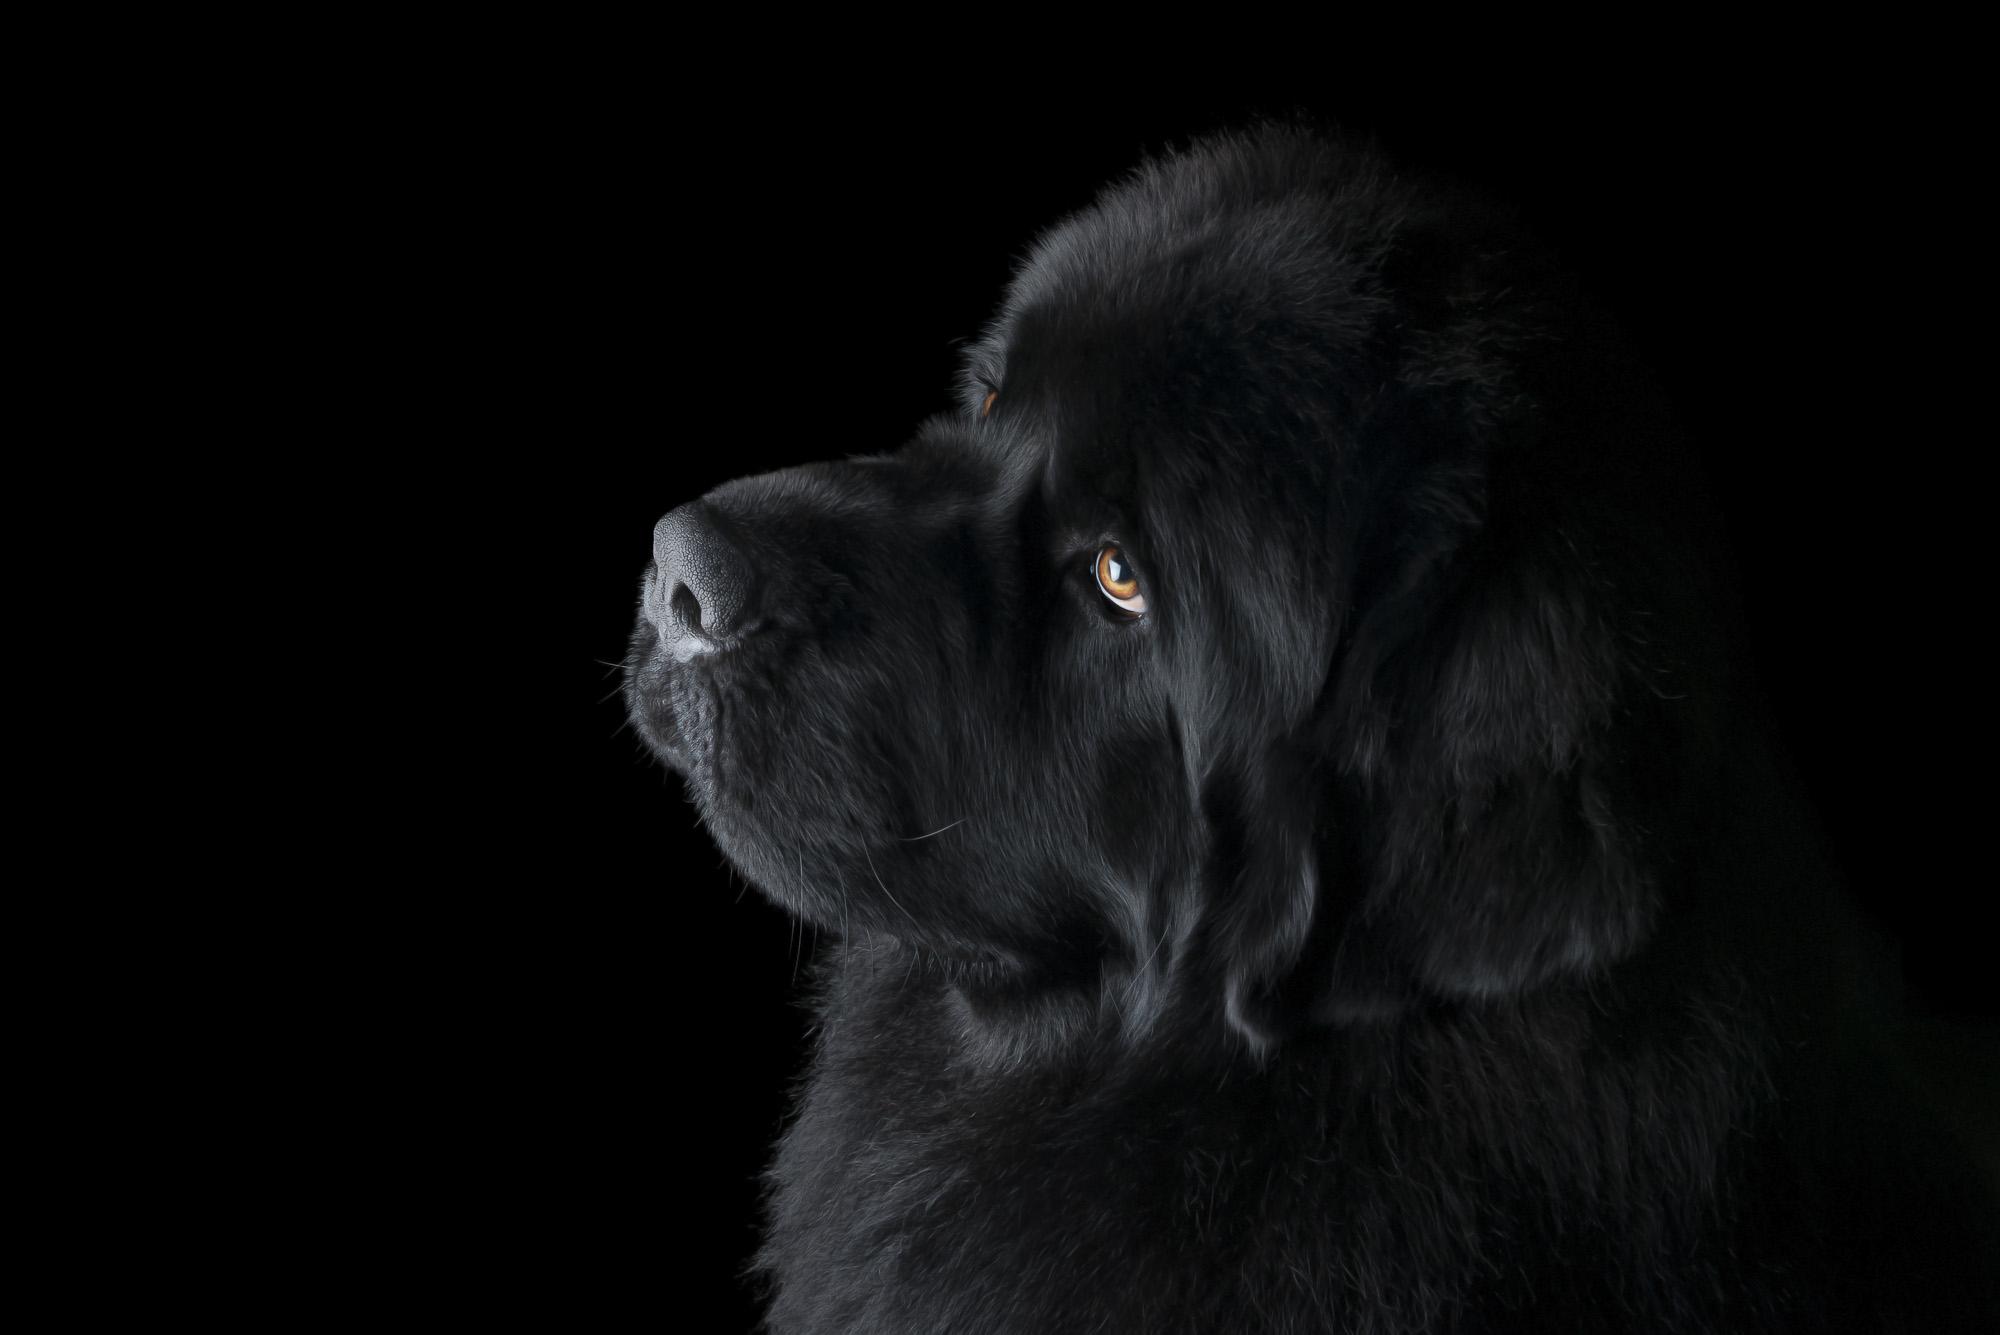 LupinBay-0122-Newfoundland-Dog-NZ-Champion-Miquelon-Rolls-Royce-Phantom-Pet-Photography-2251.jpg